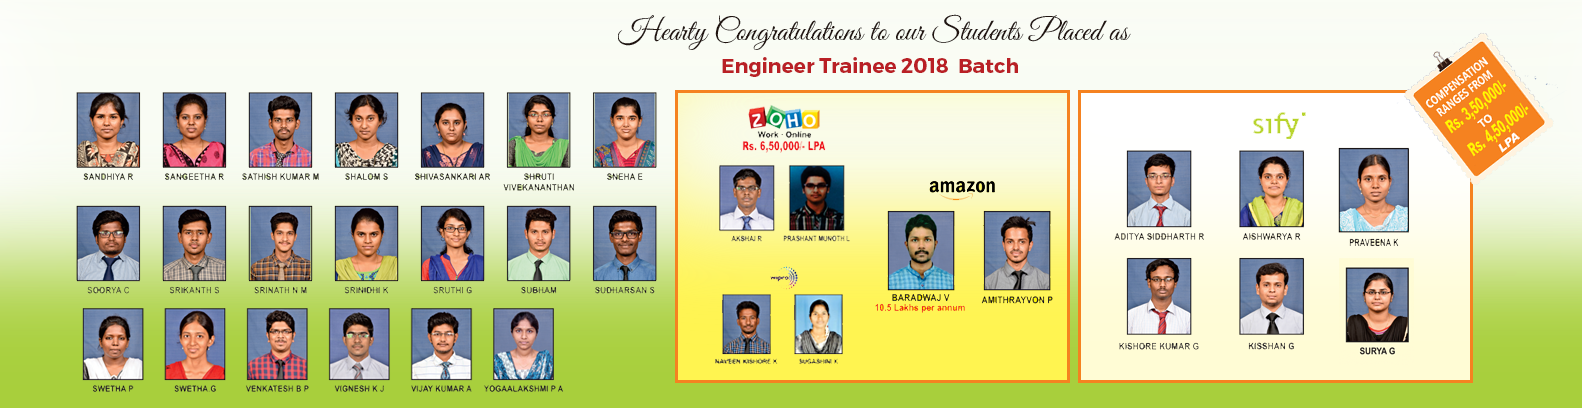 Engineer_trainee_2018_2